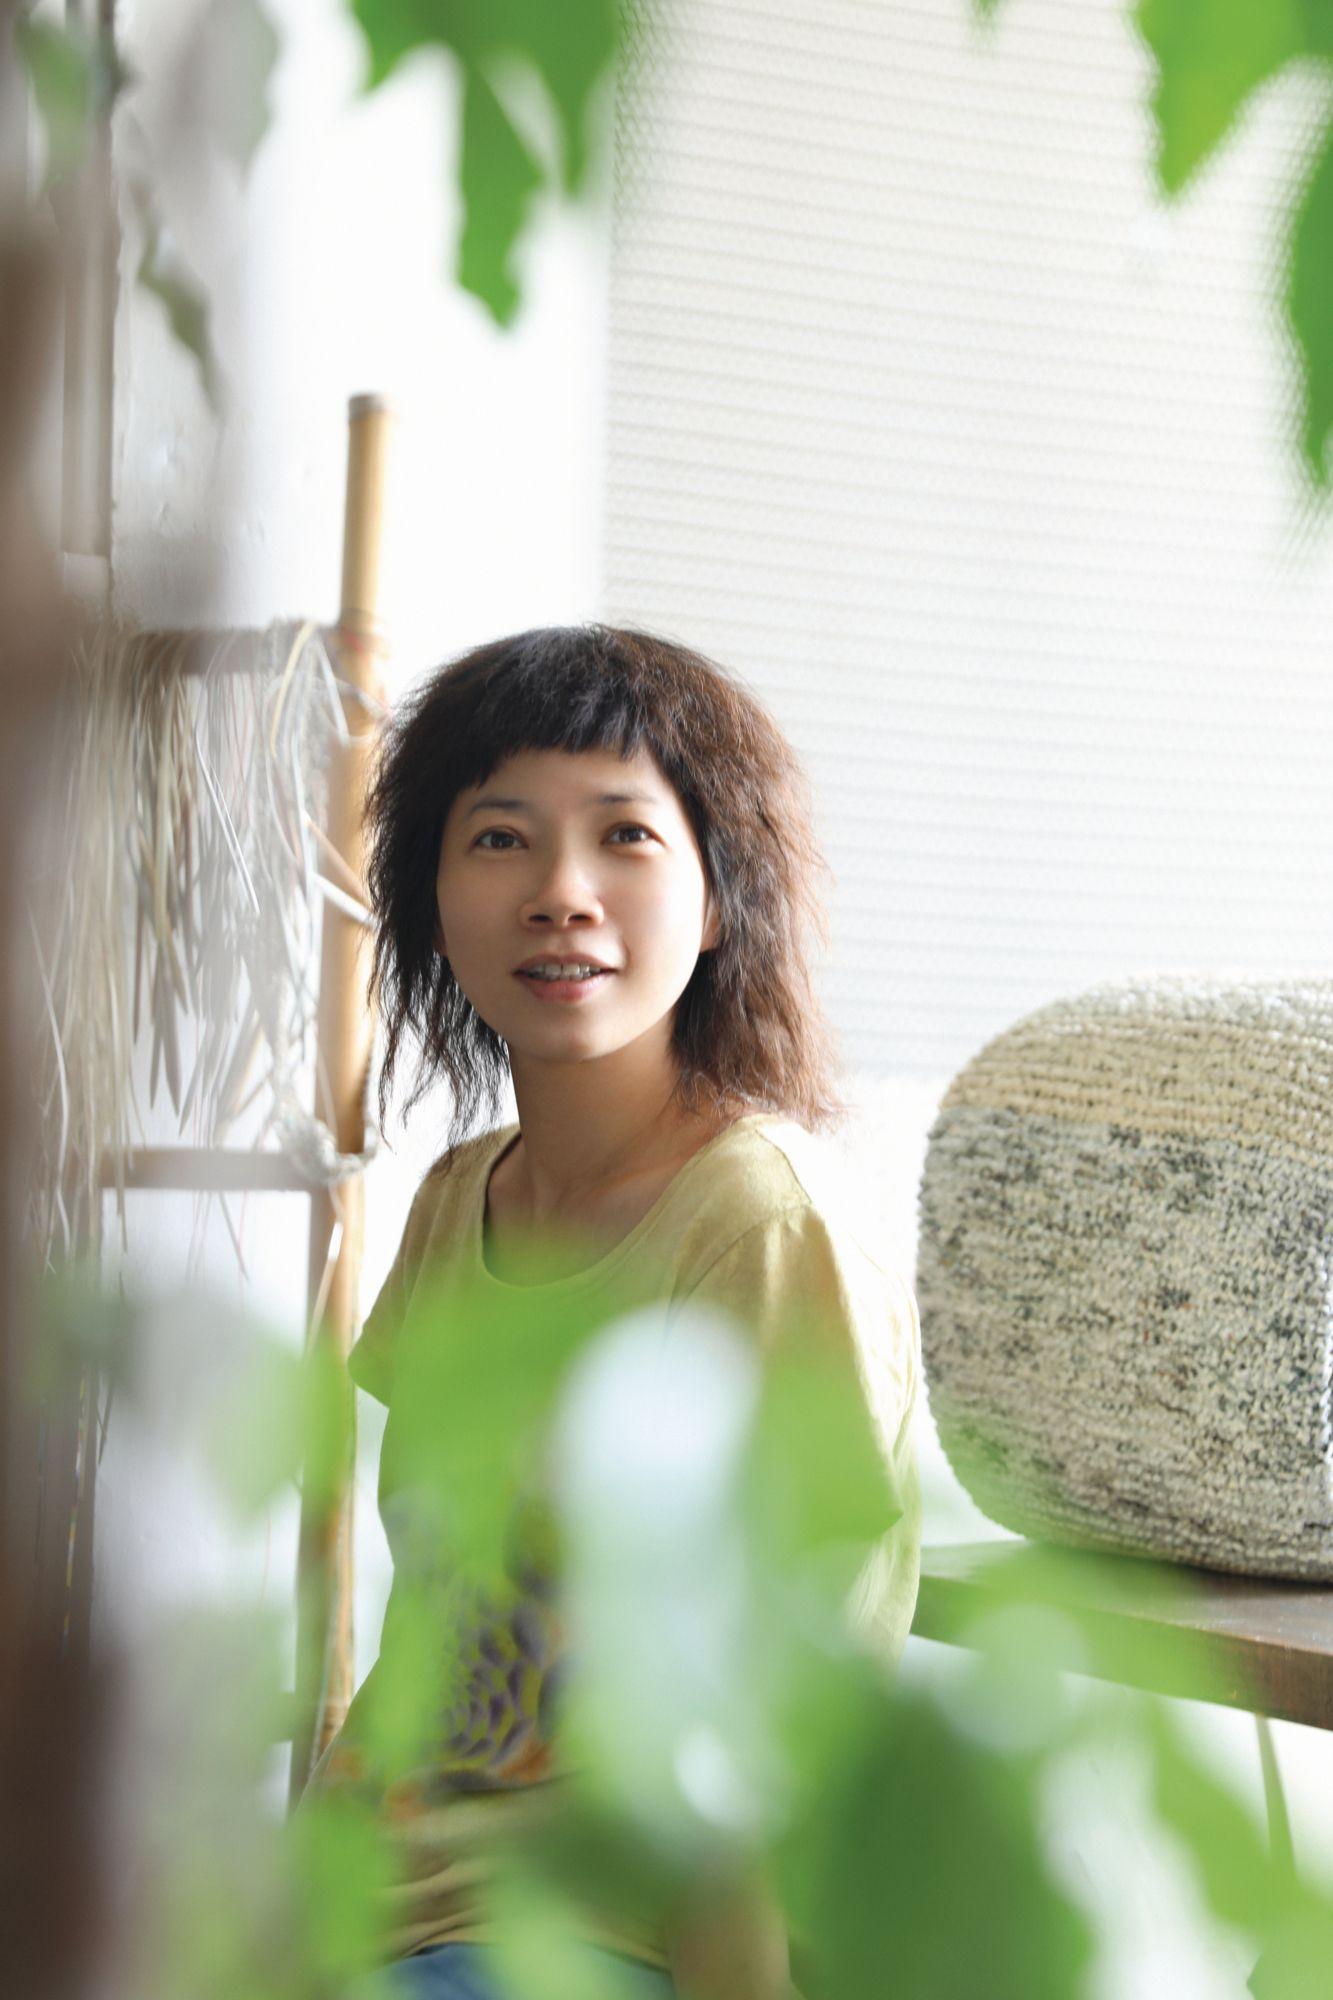 Hong Kong Artist Movana Chen On Making Art During The Pandemic